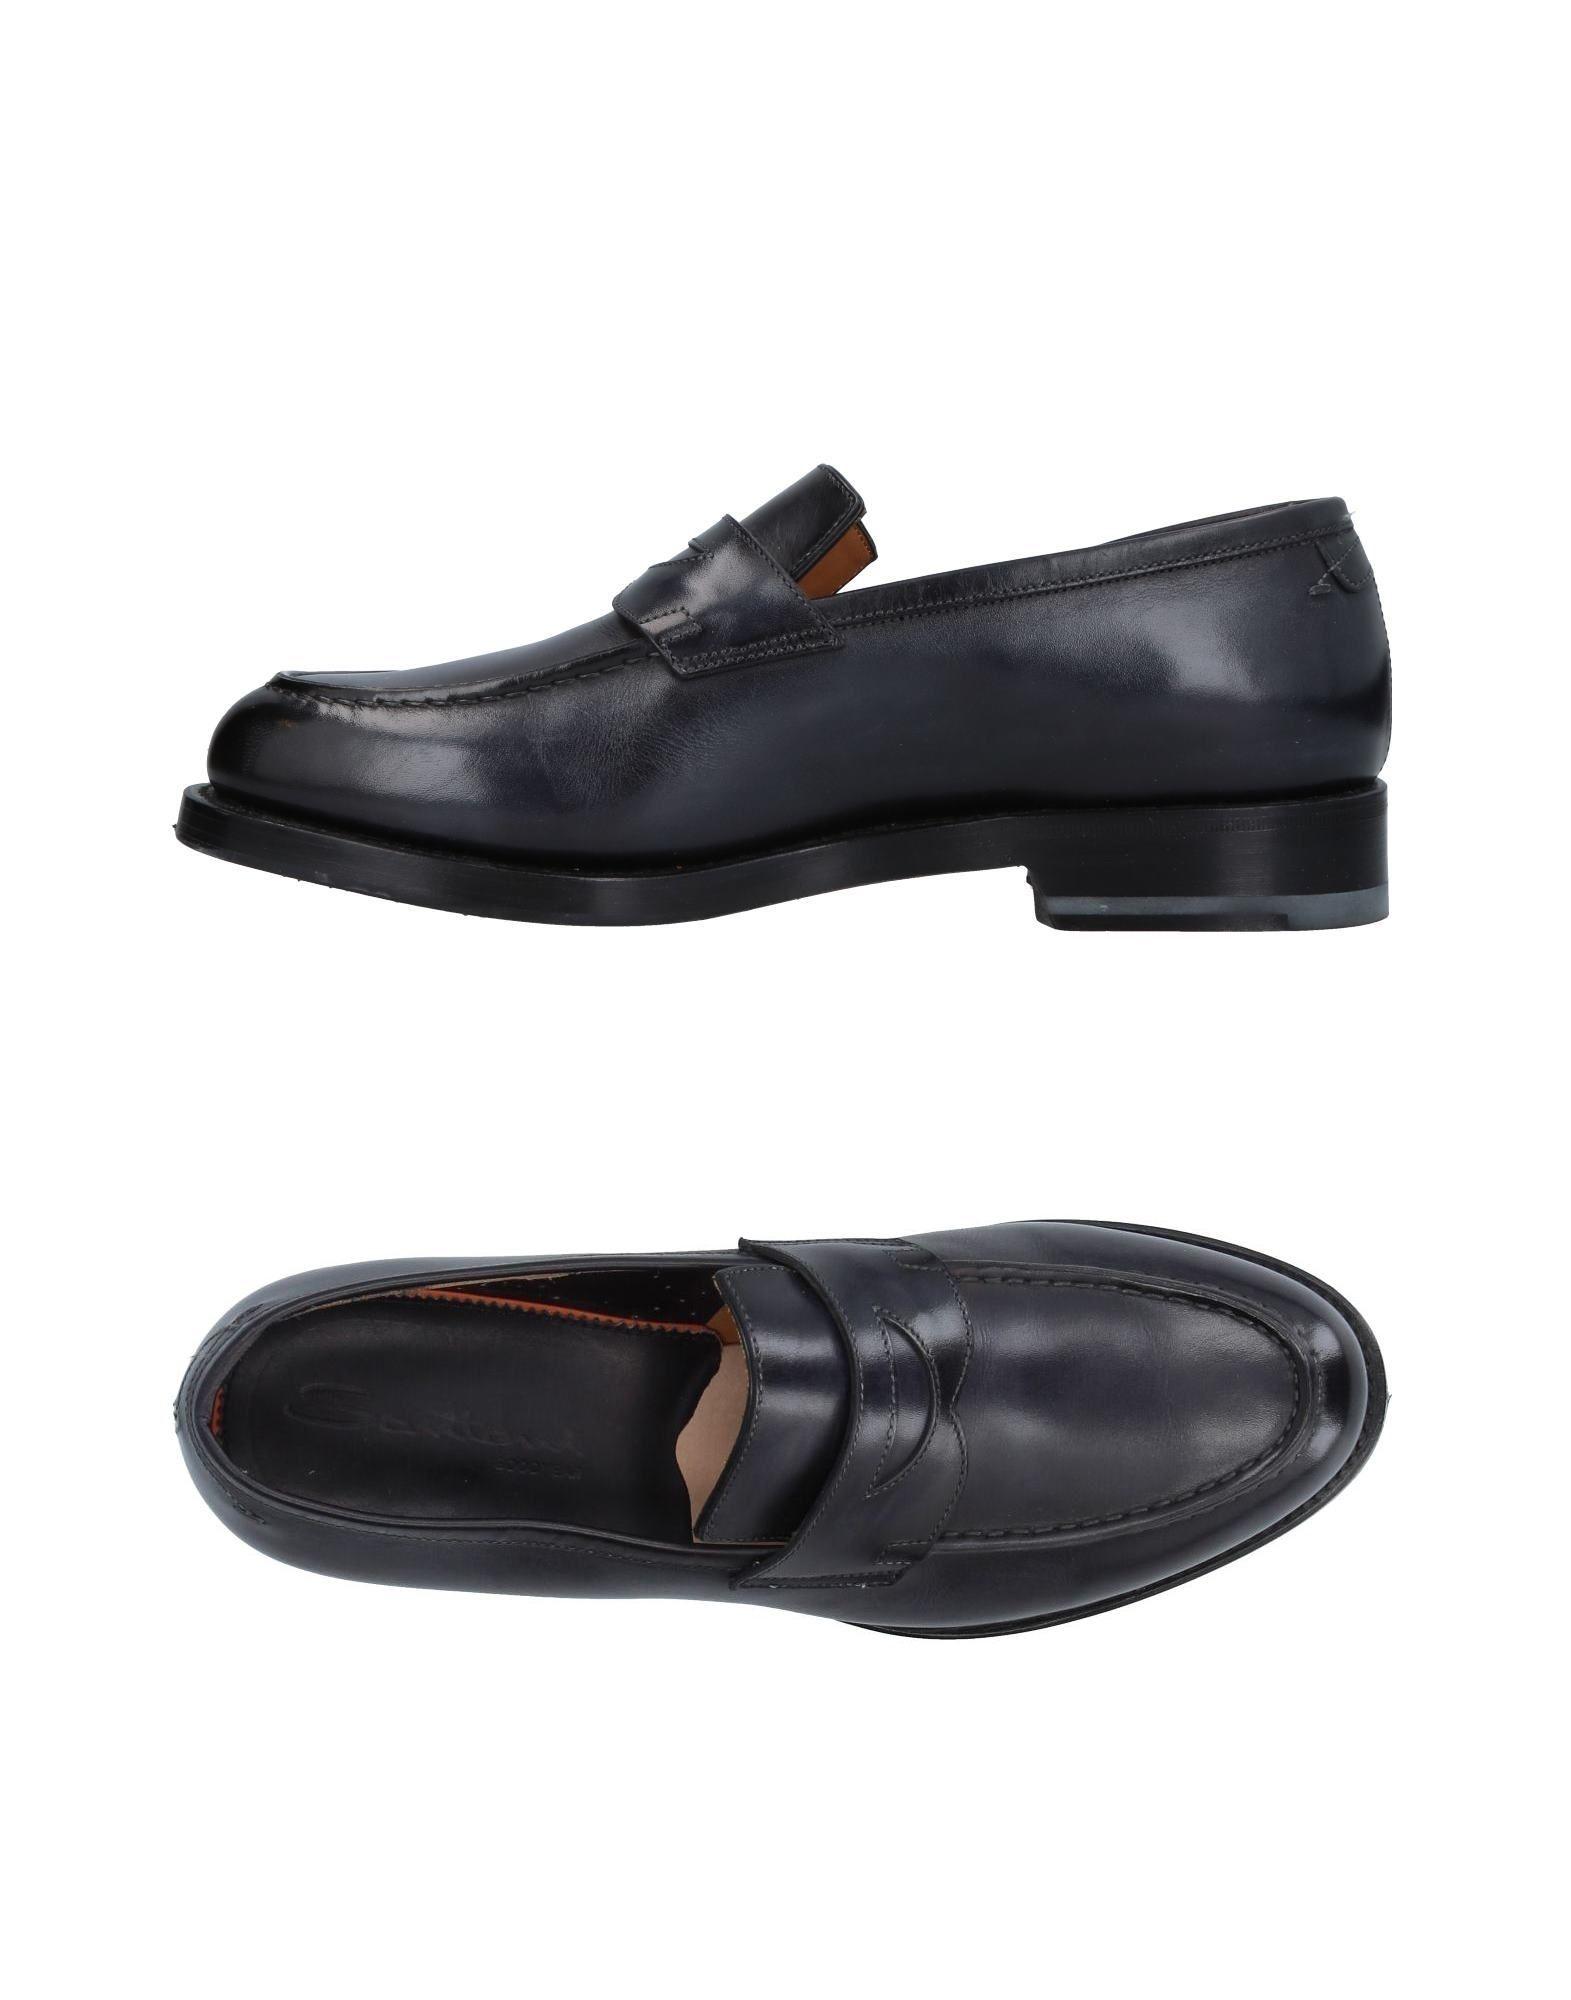 Santoni Mokassins Herren  11409583CR Gute Qualität beliebte Schuhe